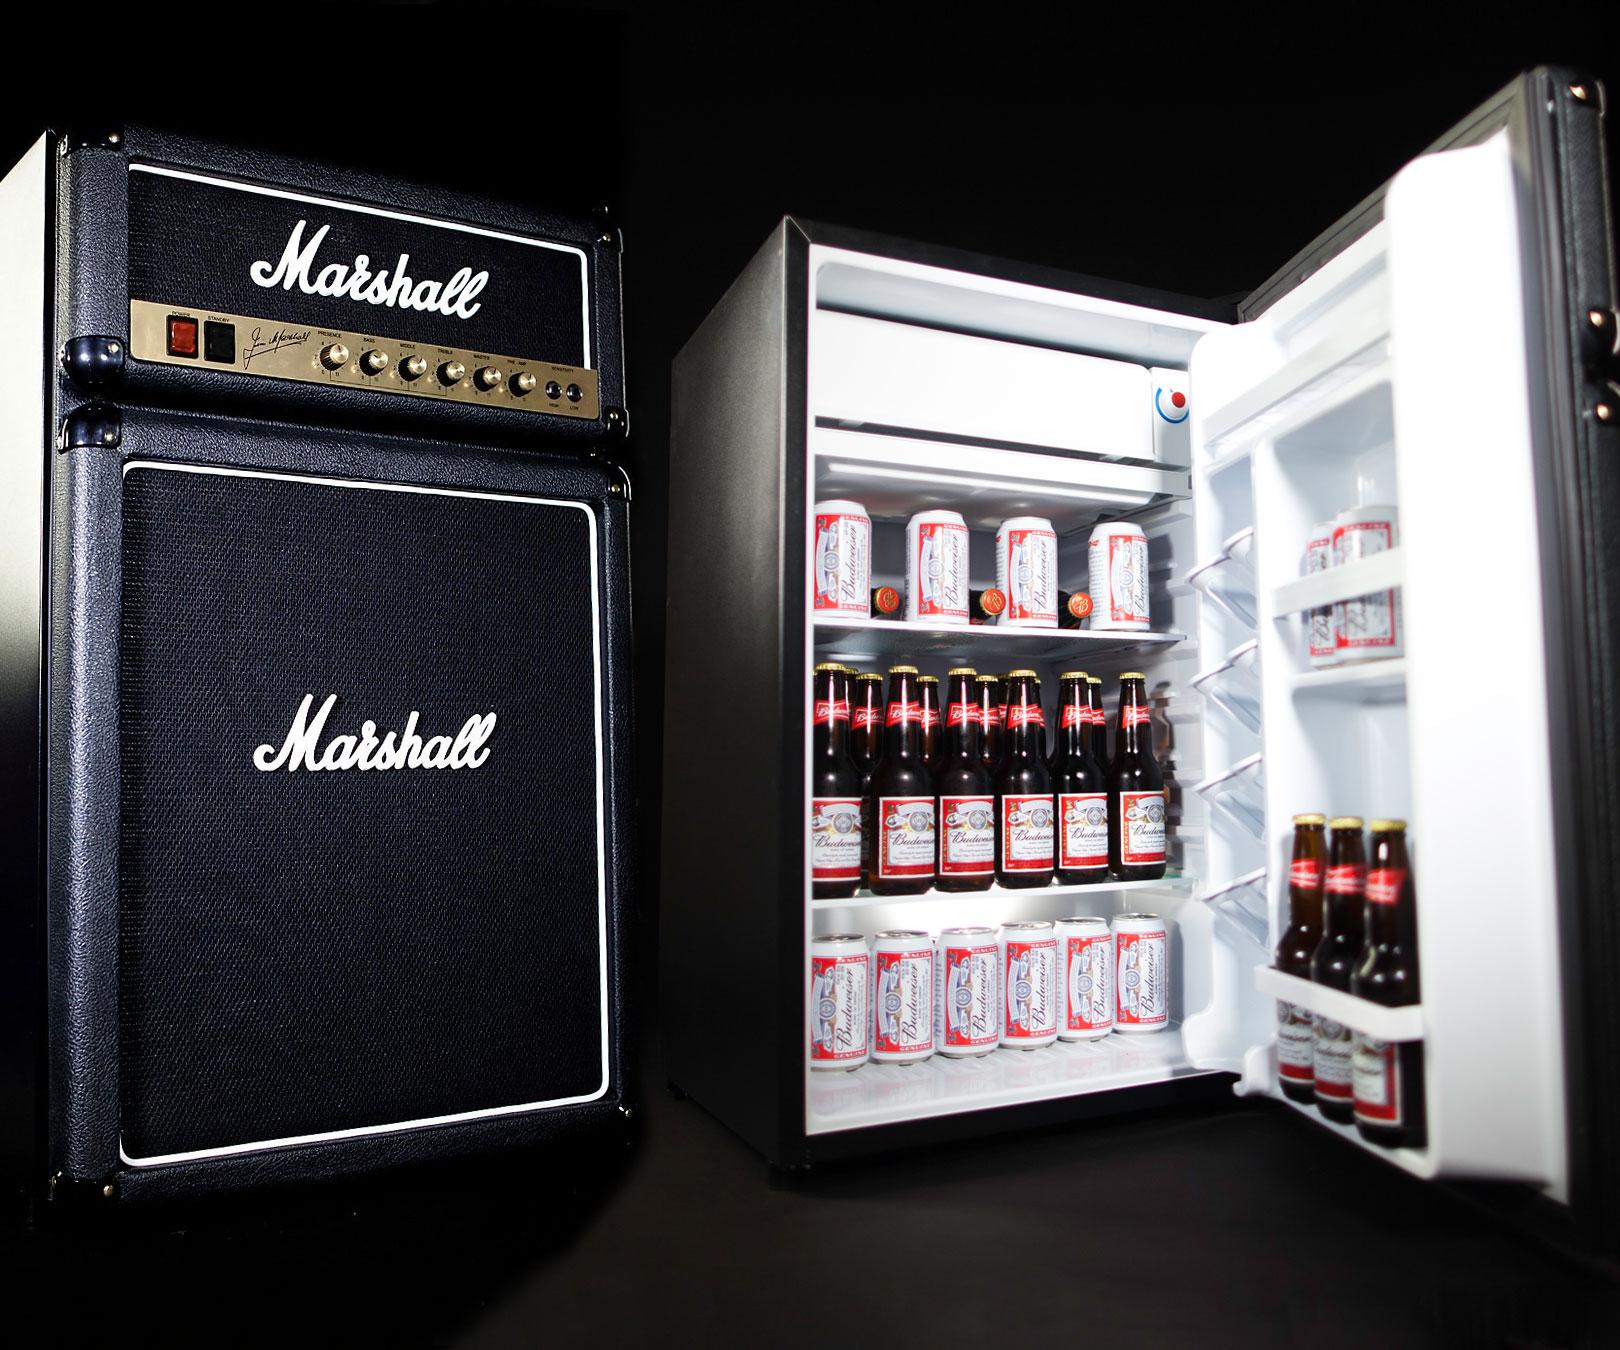 Marshall Amplifier Fridge - coolthings.us